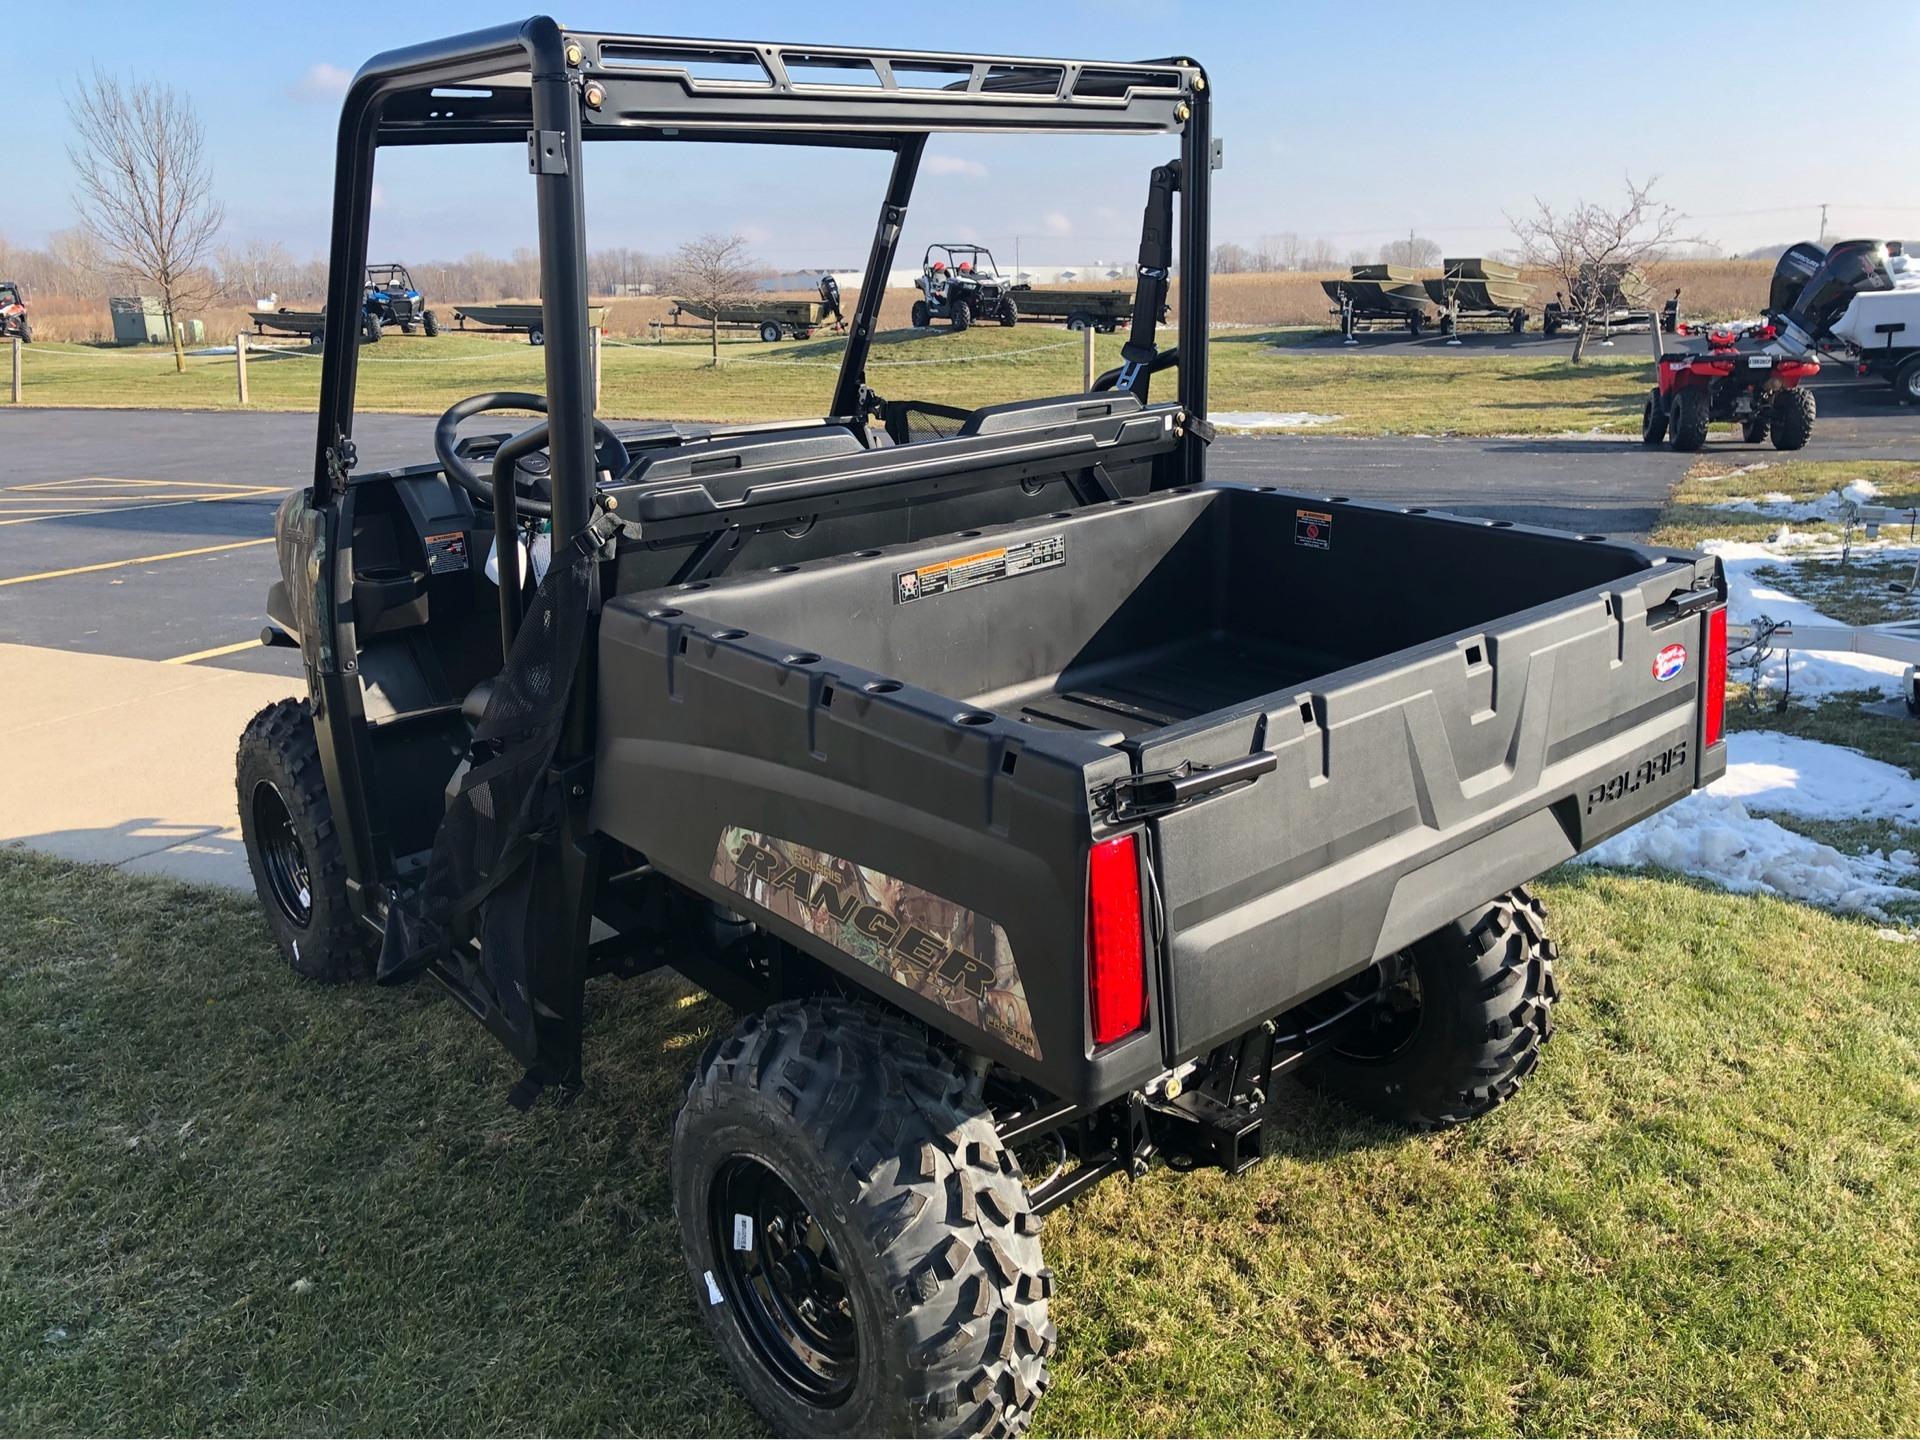 2019 Polaris Ranger 570 Polaris Pursuit Camo 4